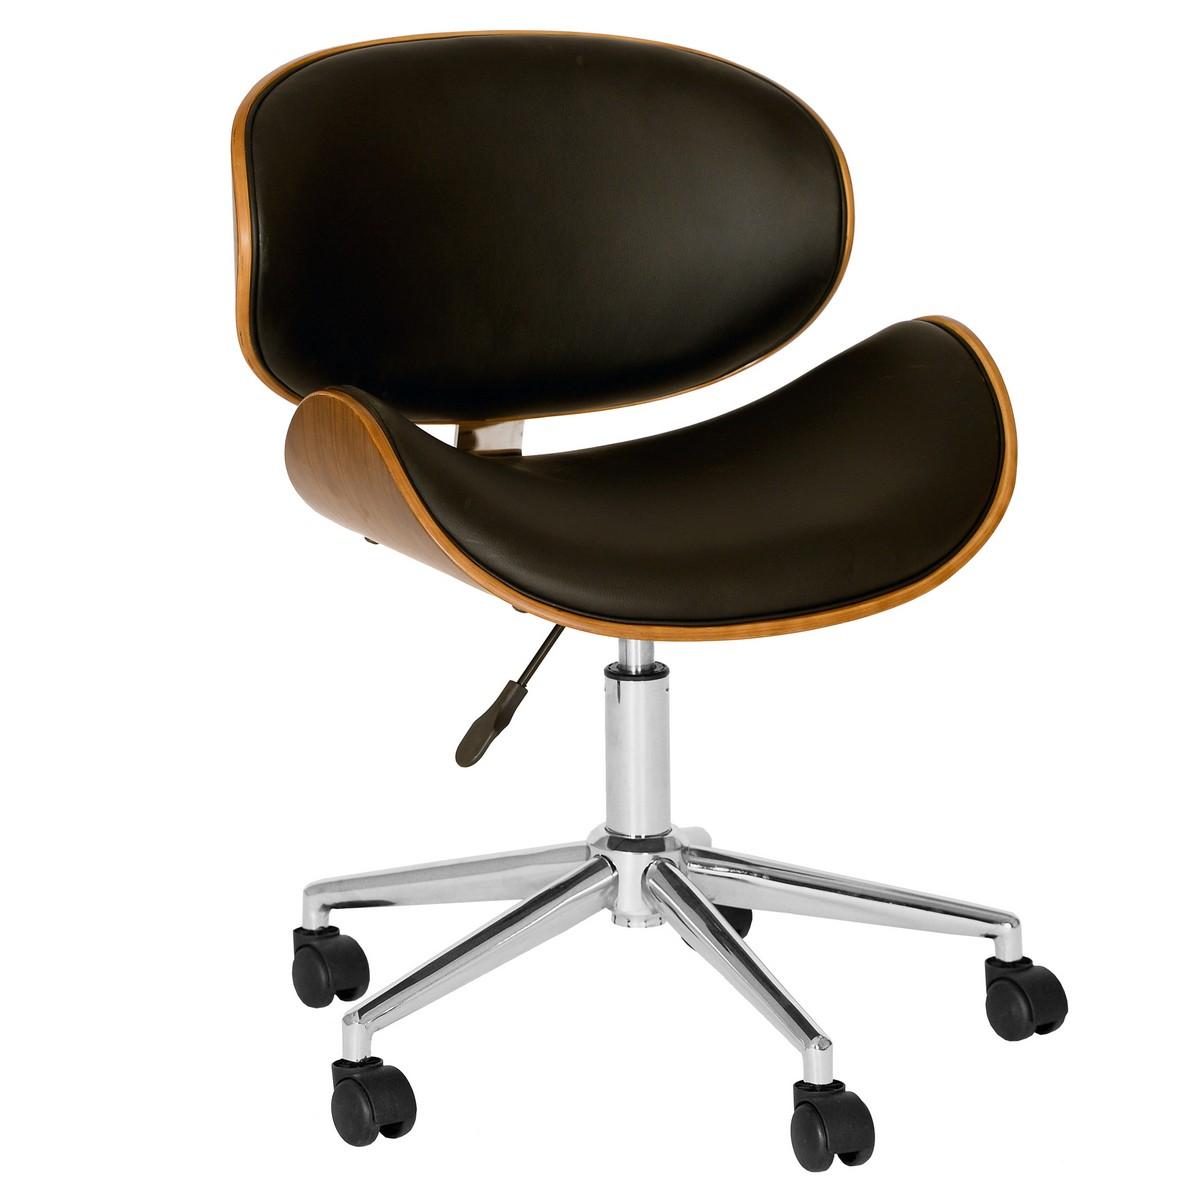 Armen Living Daphne Modern Chair In Black And Walnut Veneer Back and Chrome